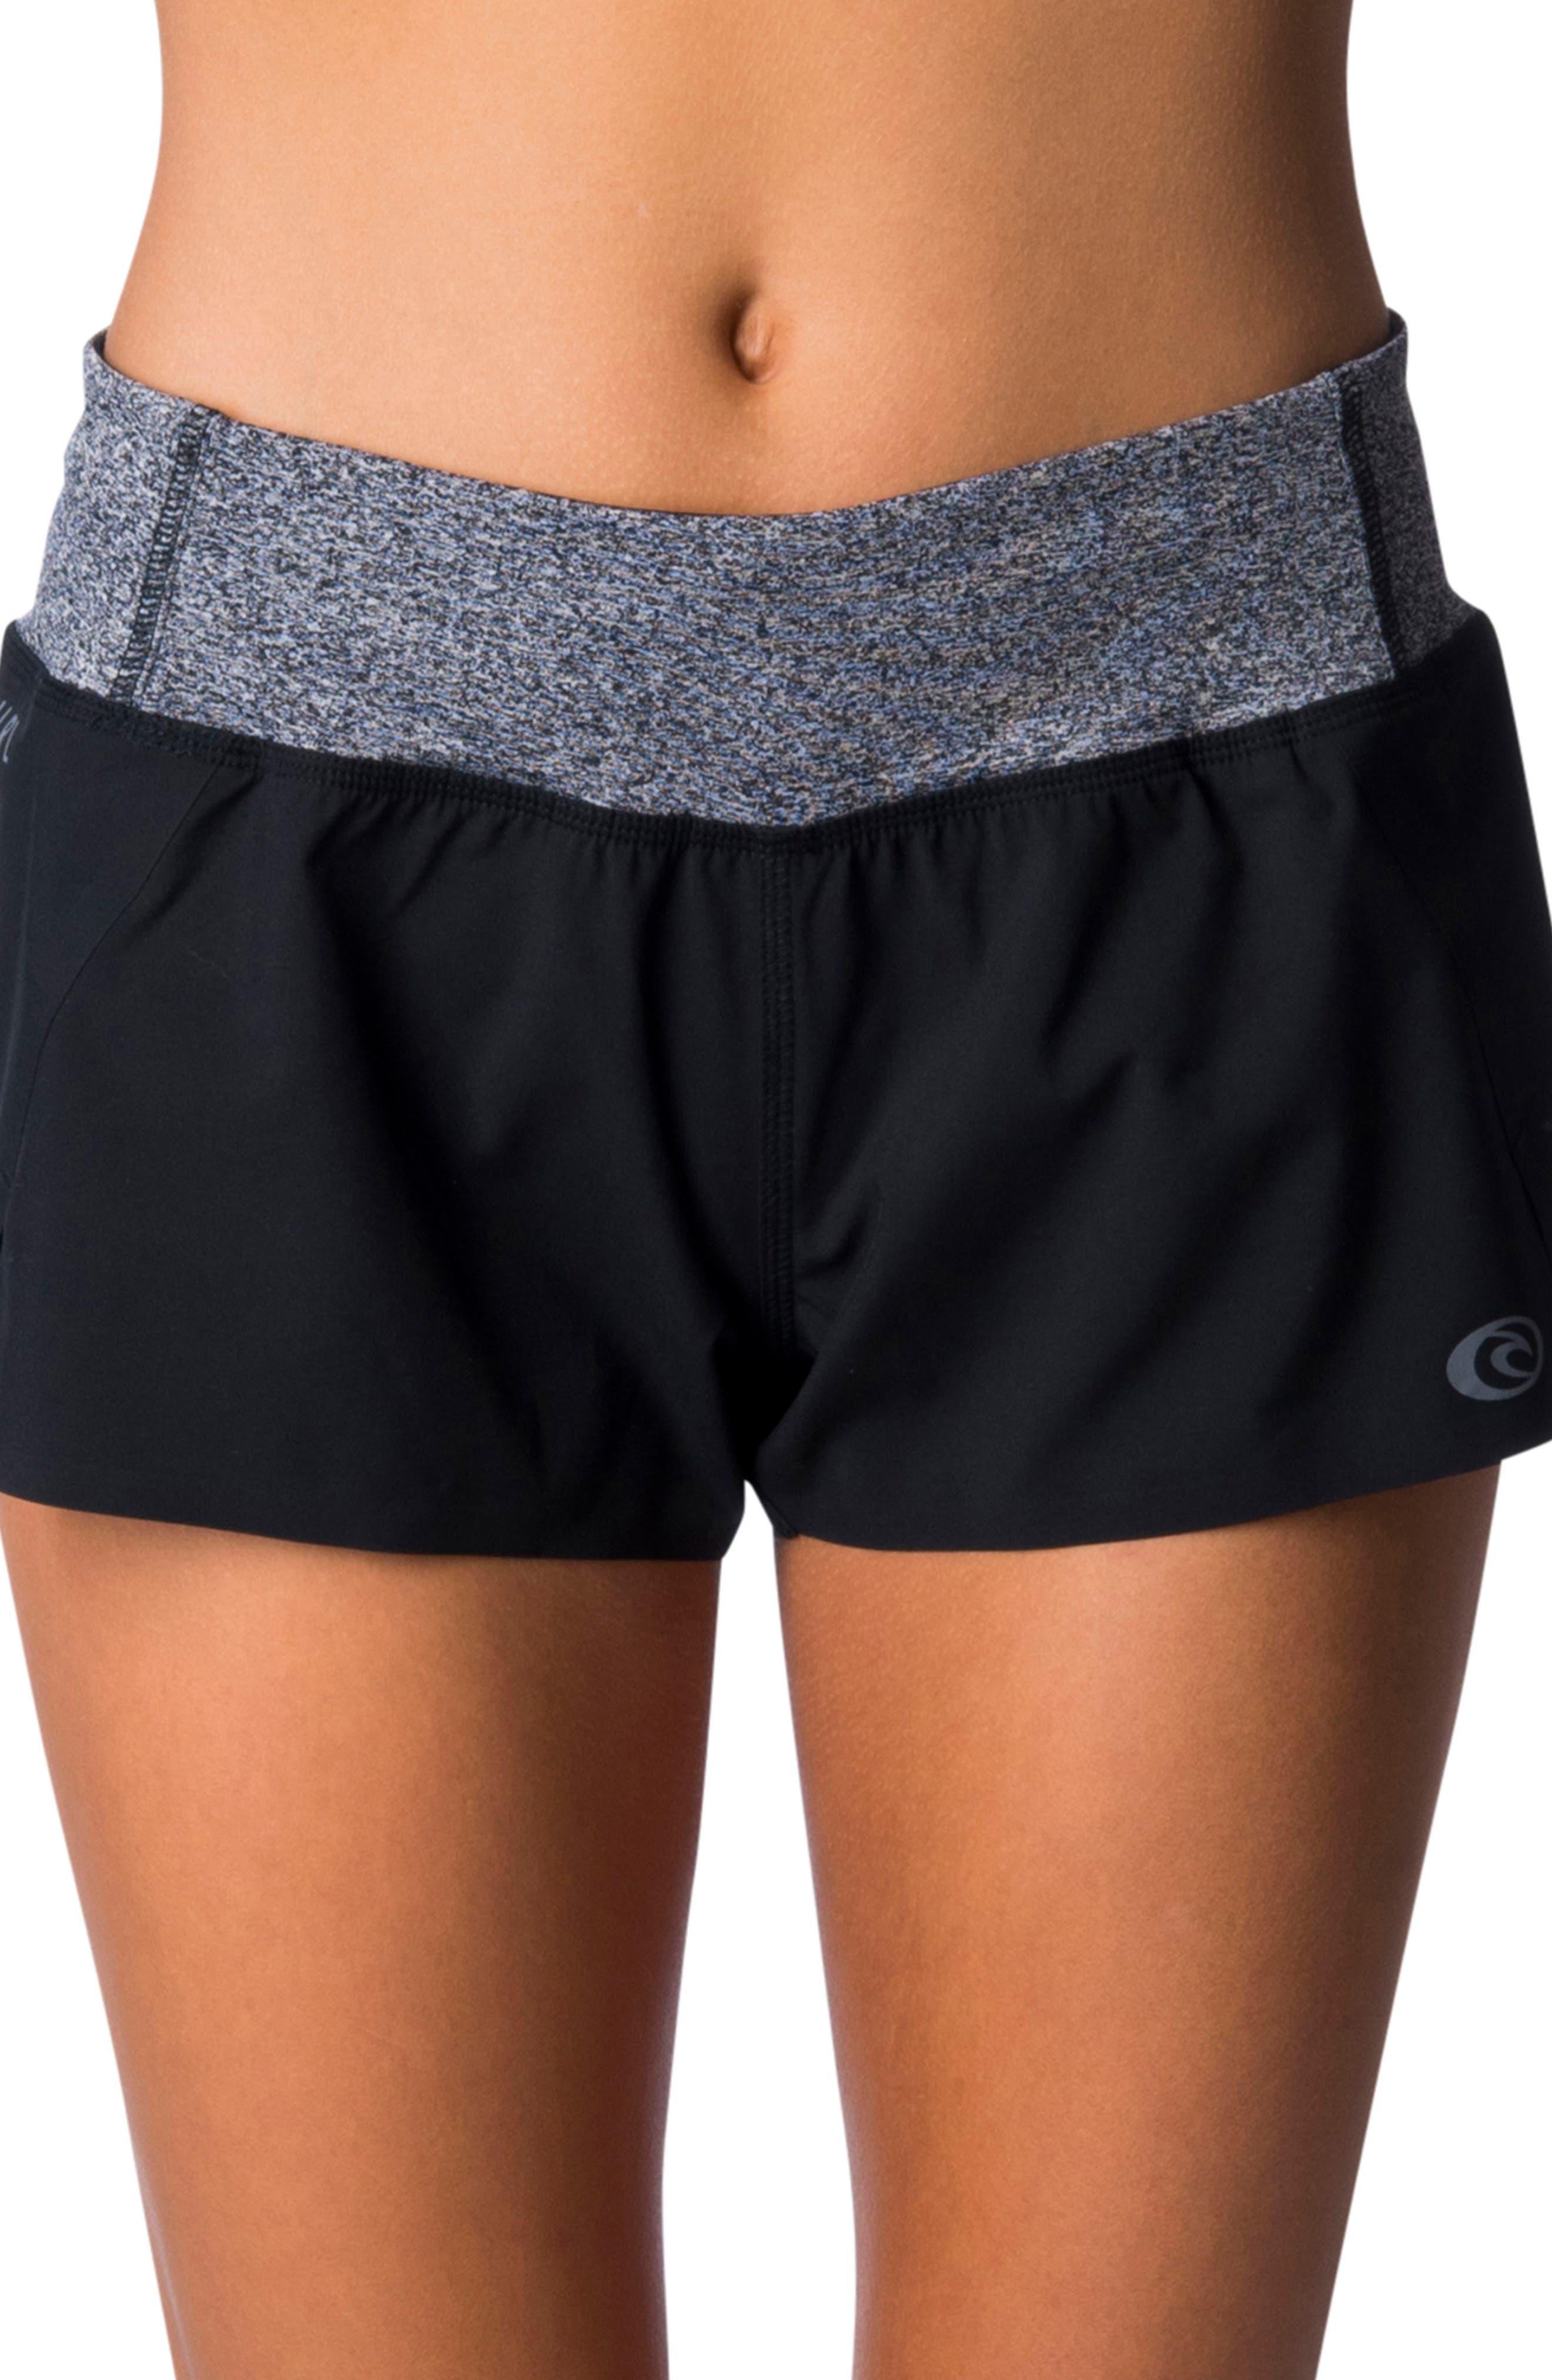 Mirage Board Shorts,                         Main,                         color, Black